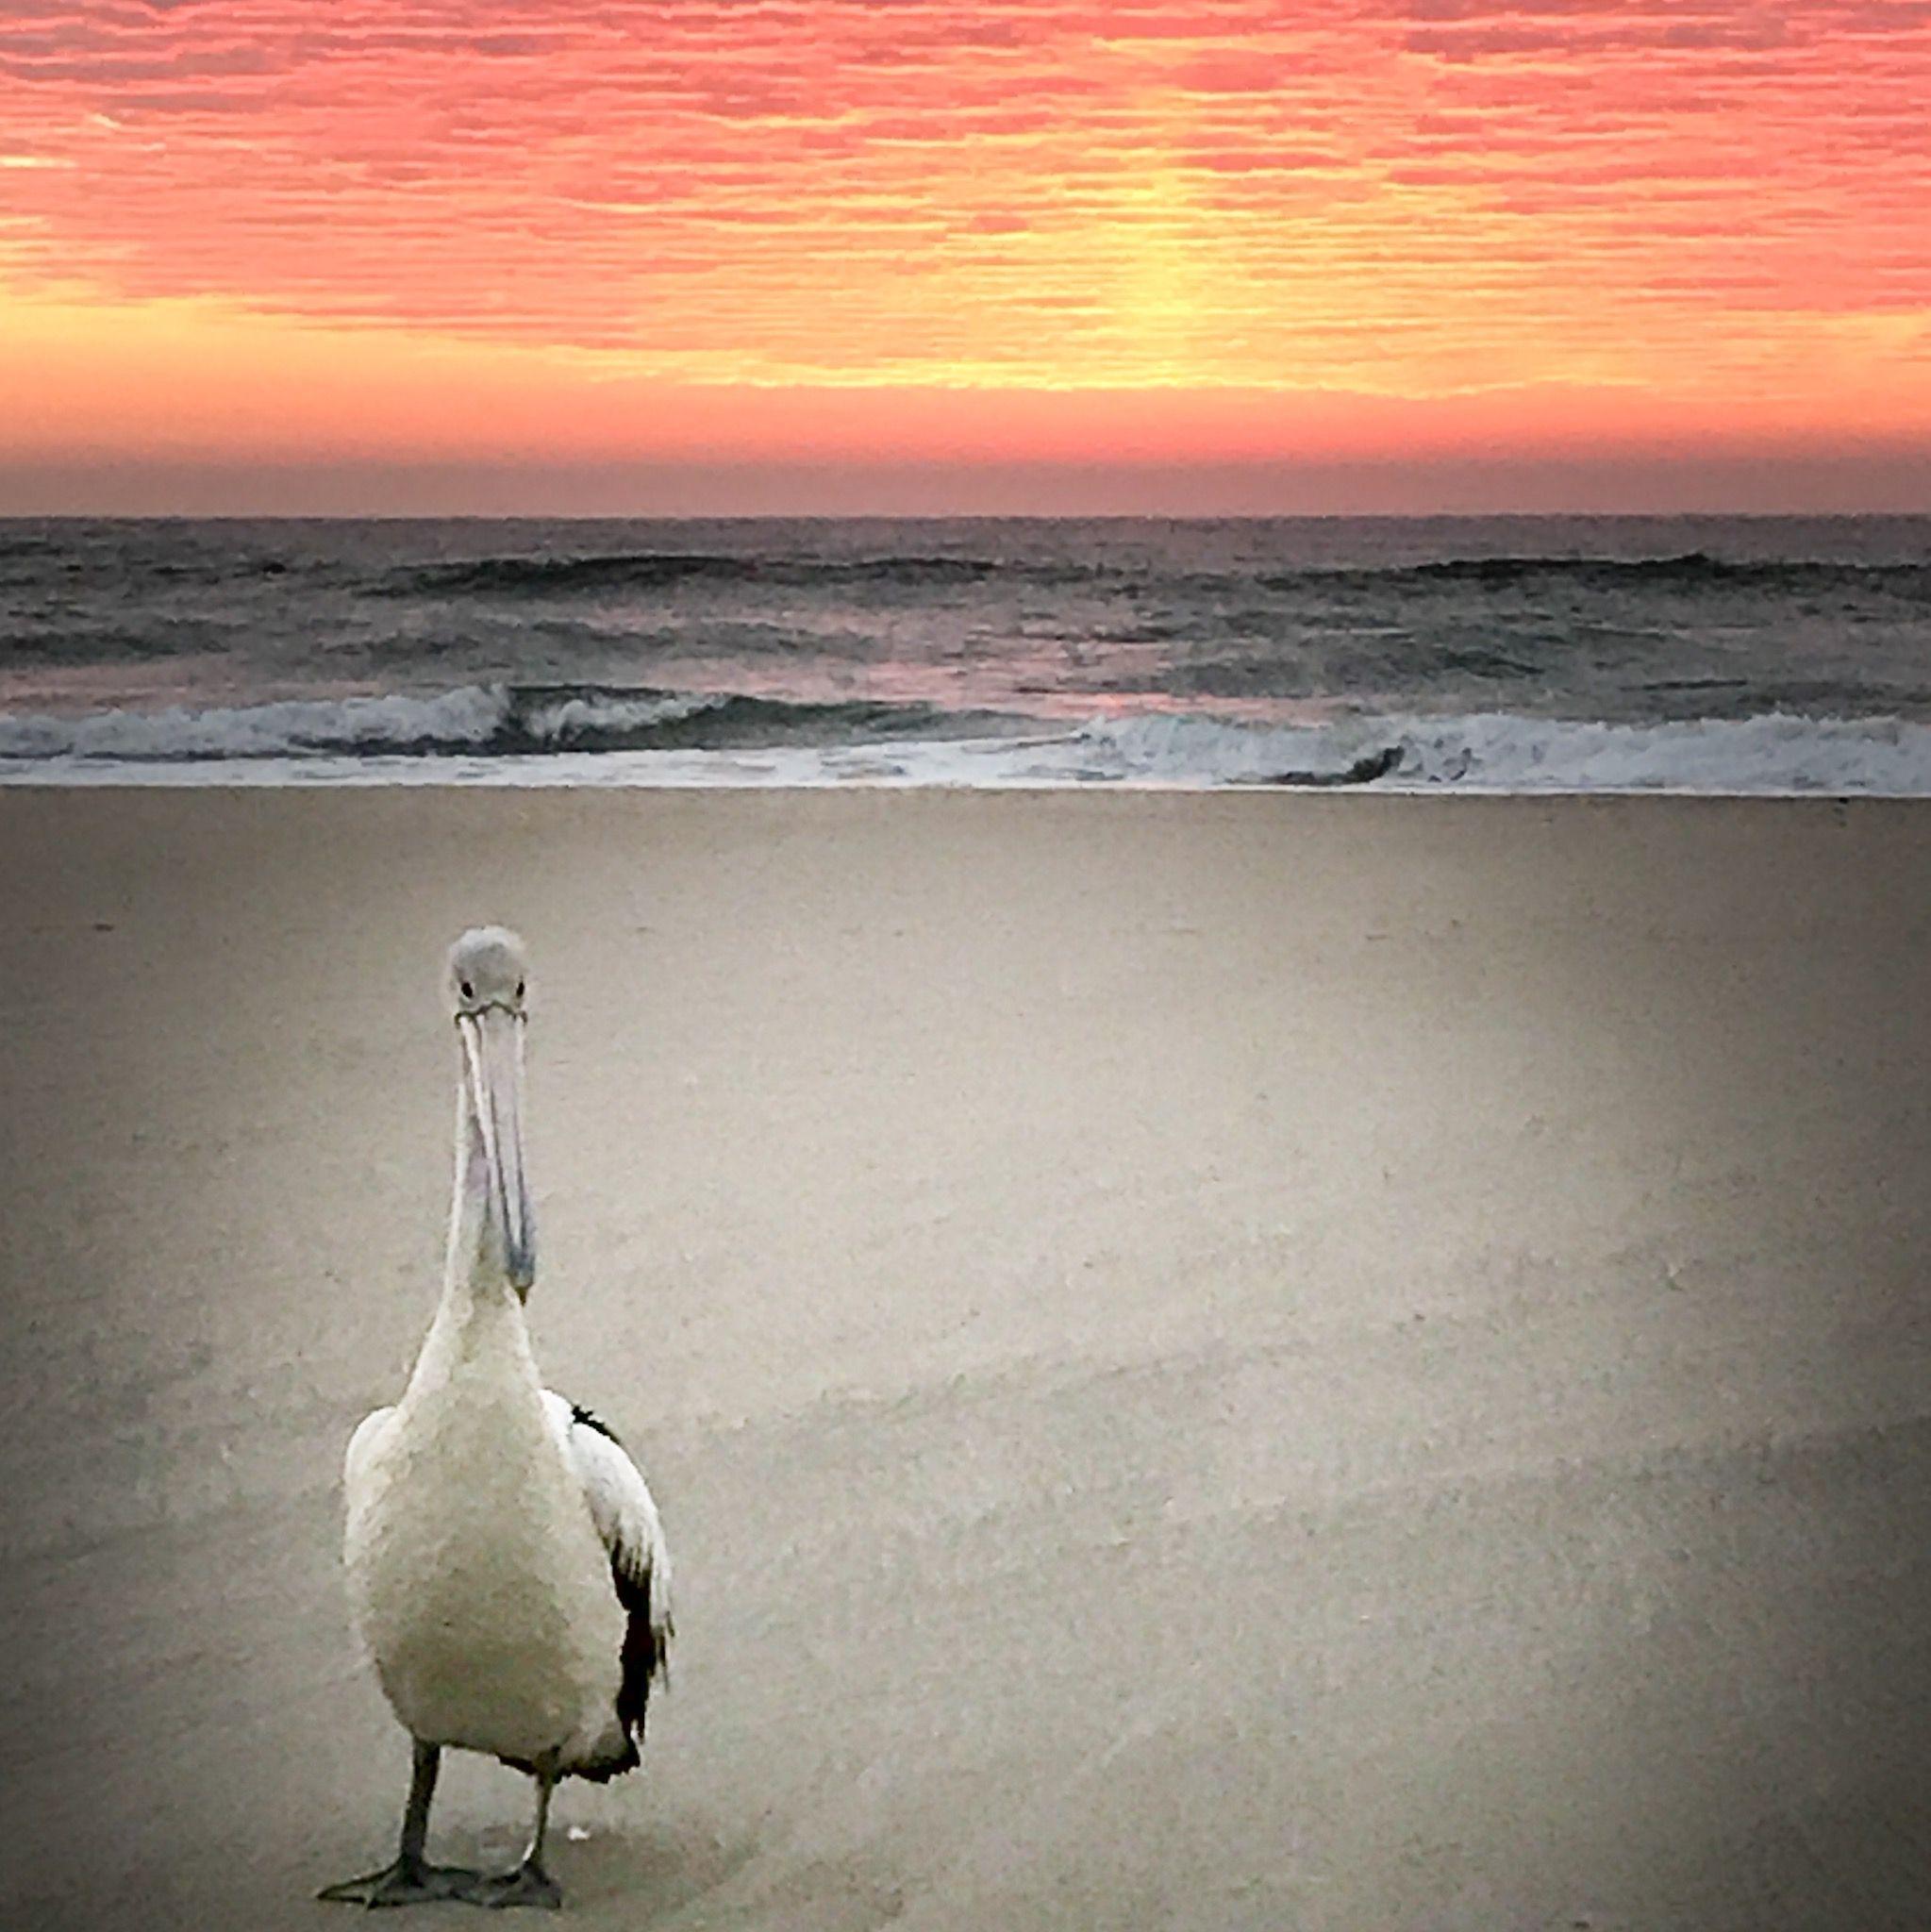 Good Morning Mr Pelican. #sunrise #pelican #beachwalk